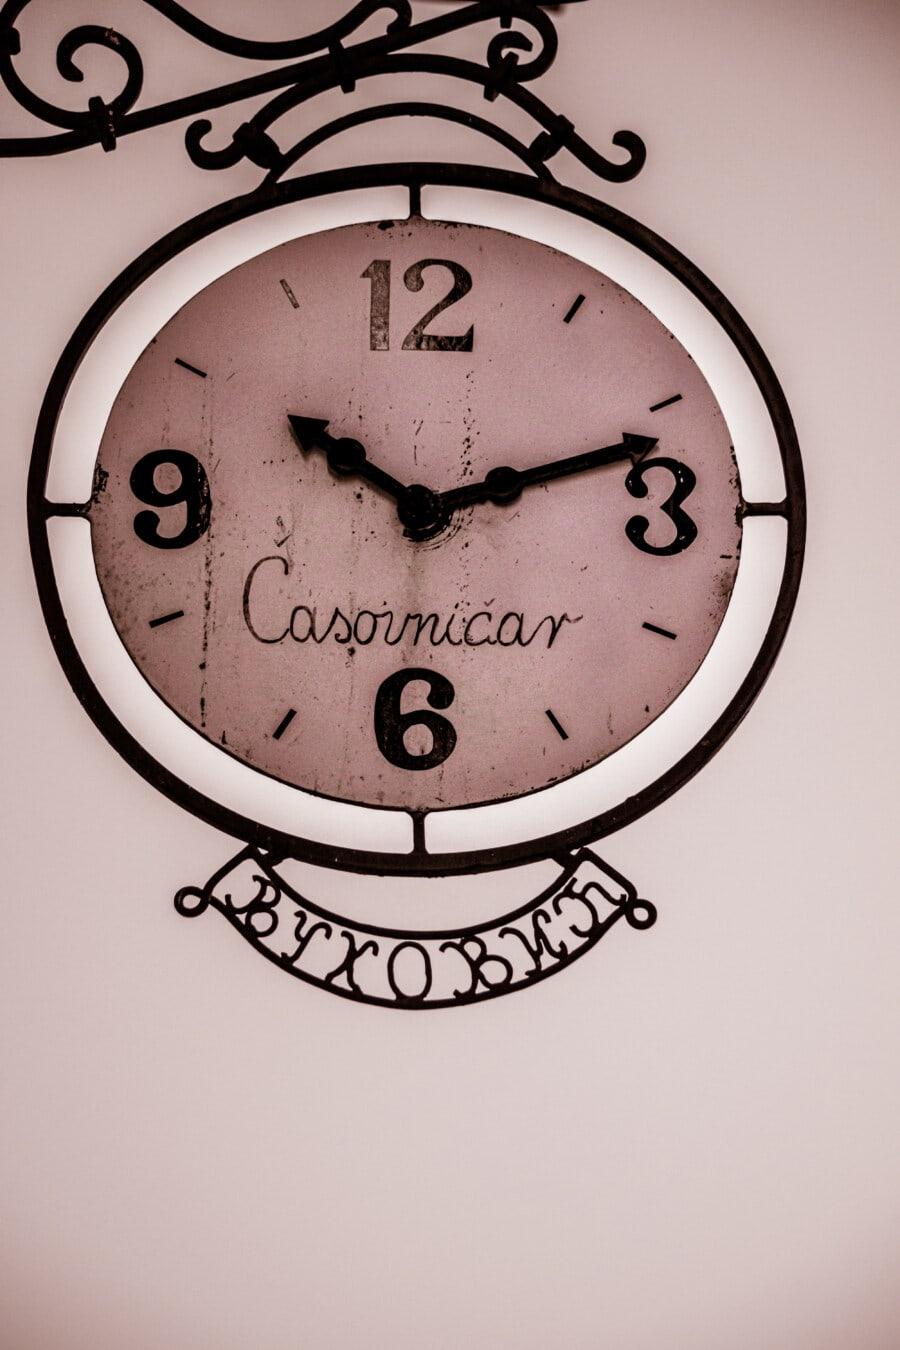 vintage, cast iron, analog clock, handmade, number, sepia, monochrome, rust, round, minute